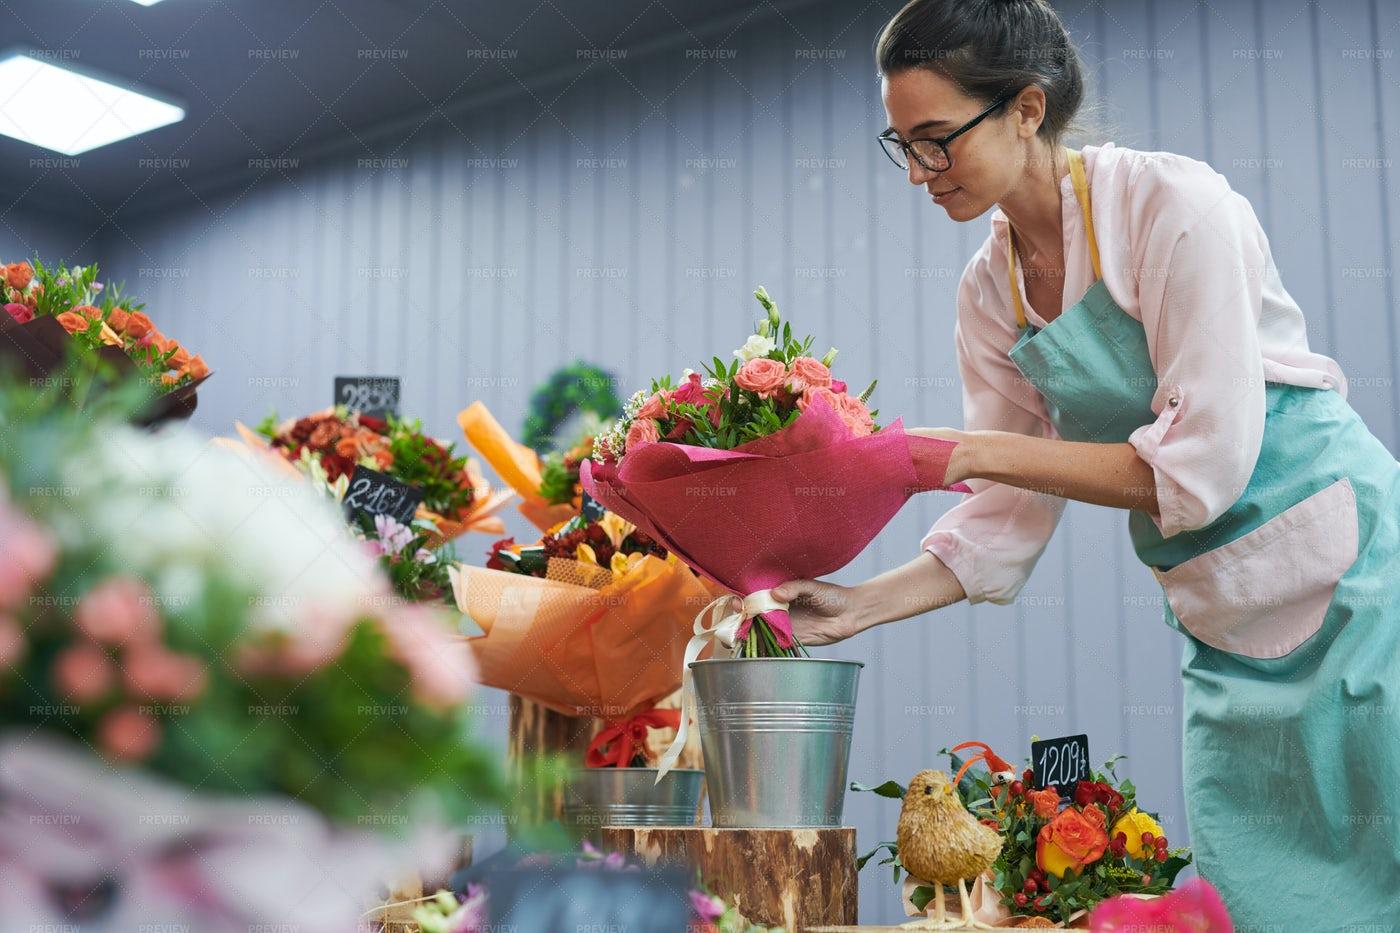 Florist Working In Shop: Stock Photos